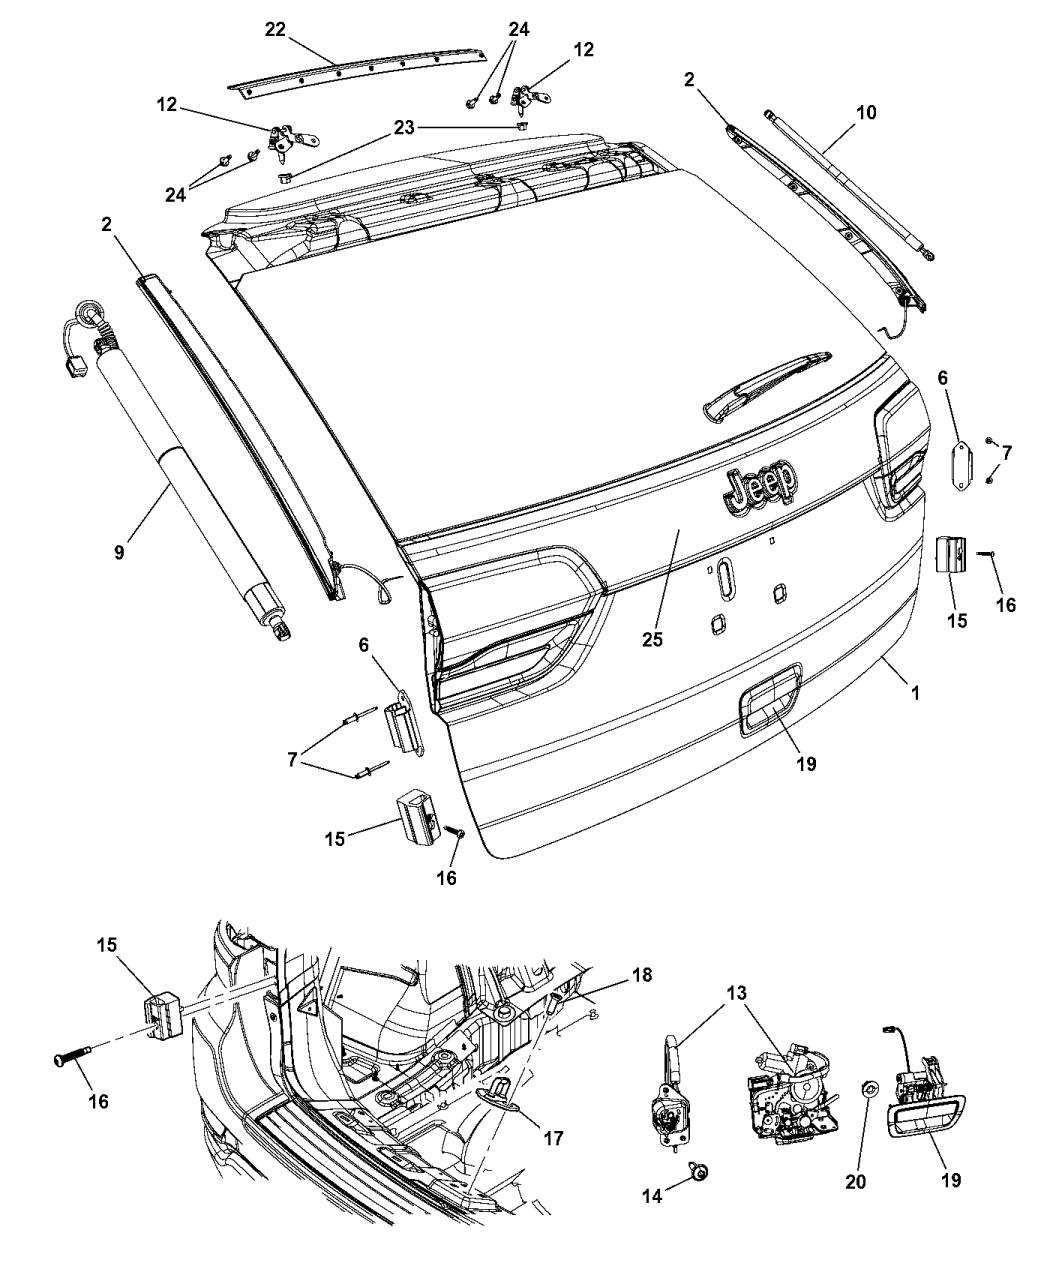 Wiring Diagram Jeep Grand Cherokee 2014